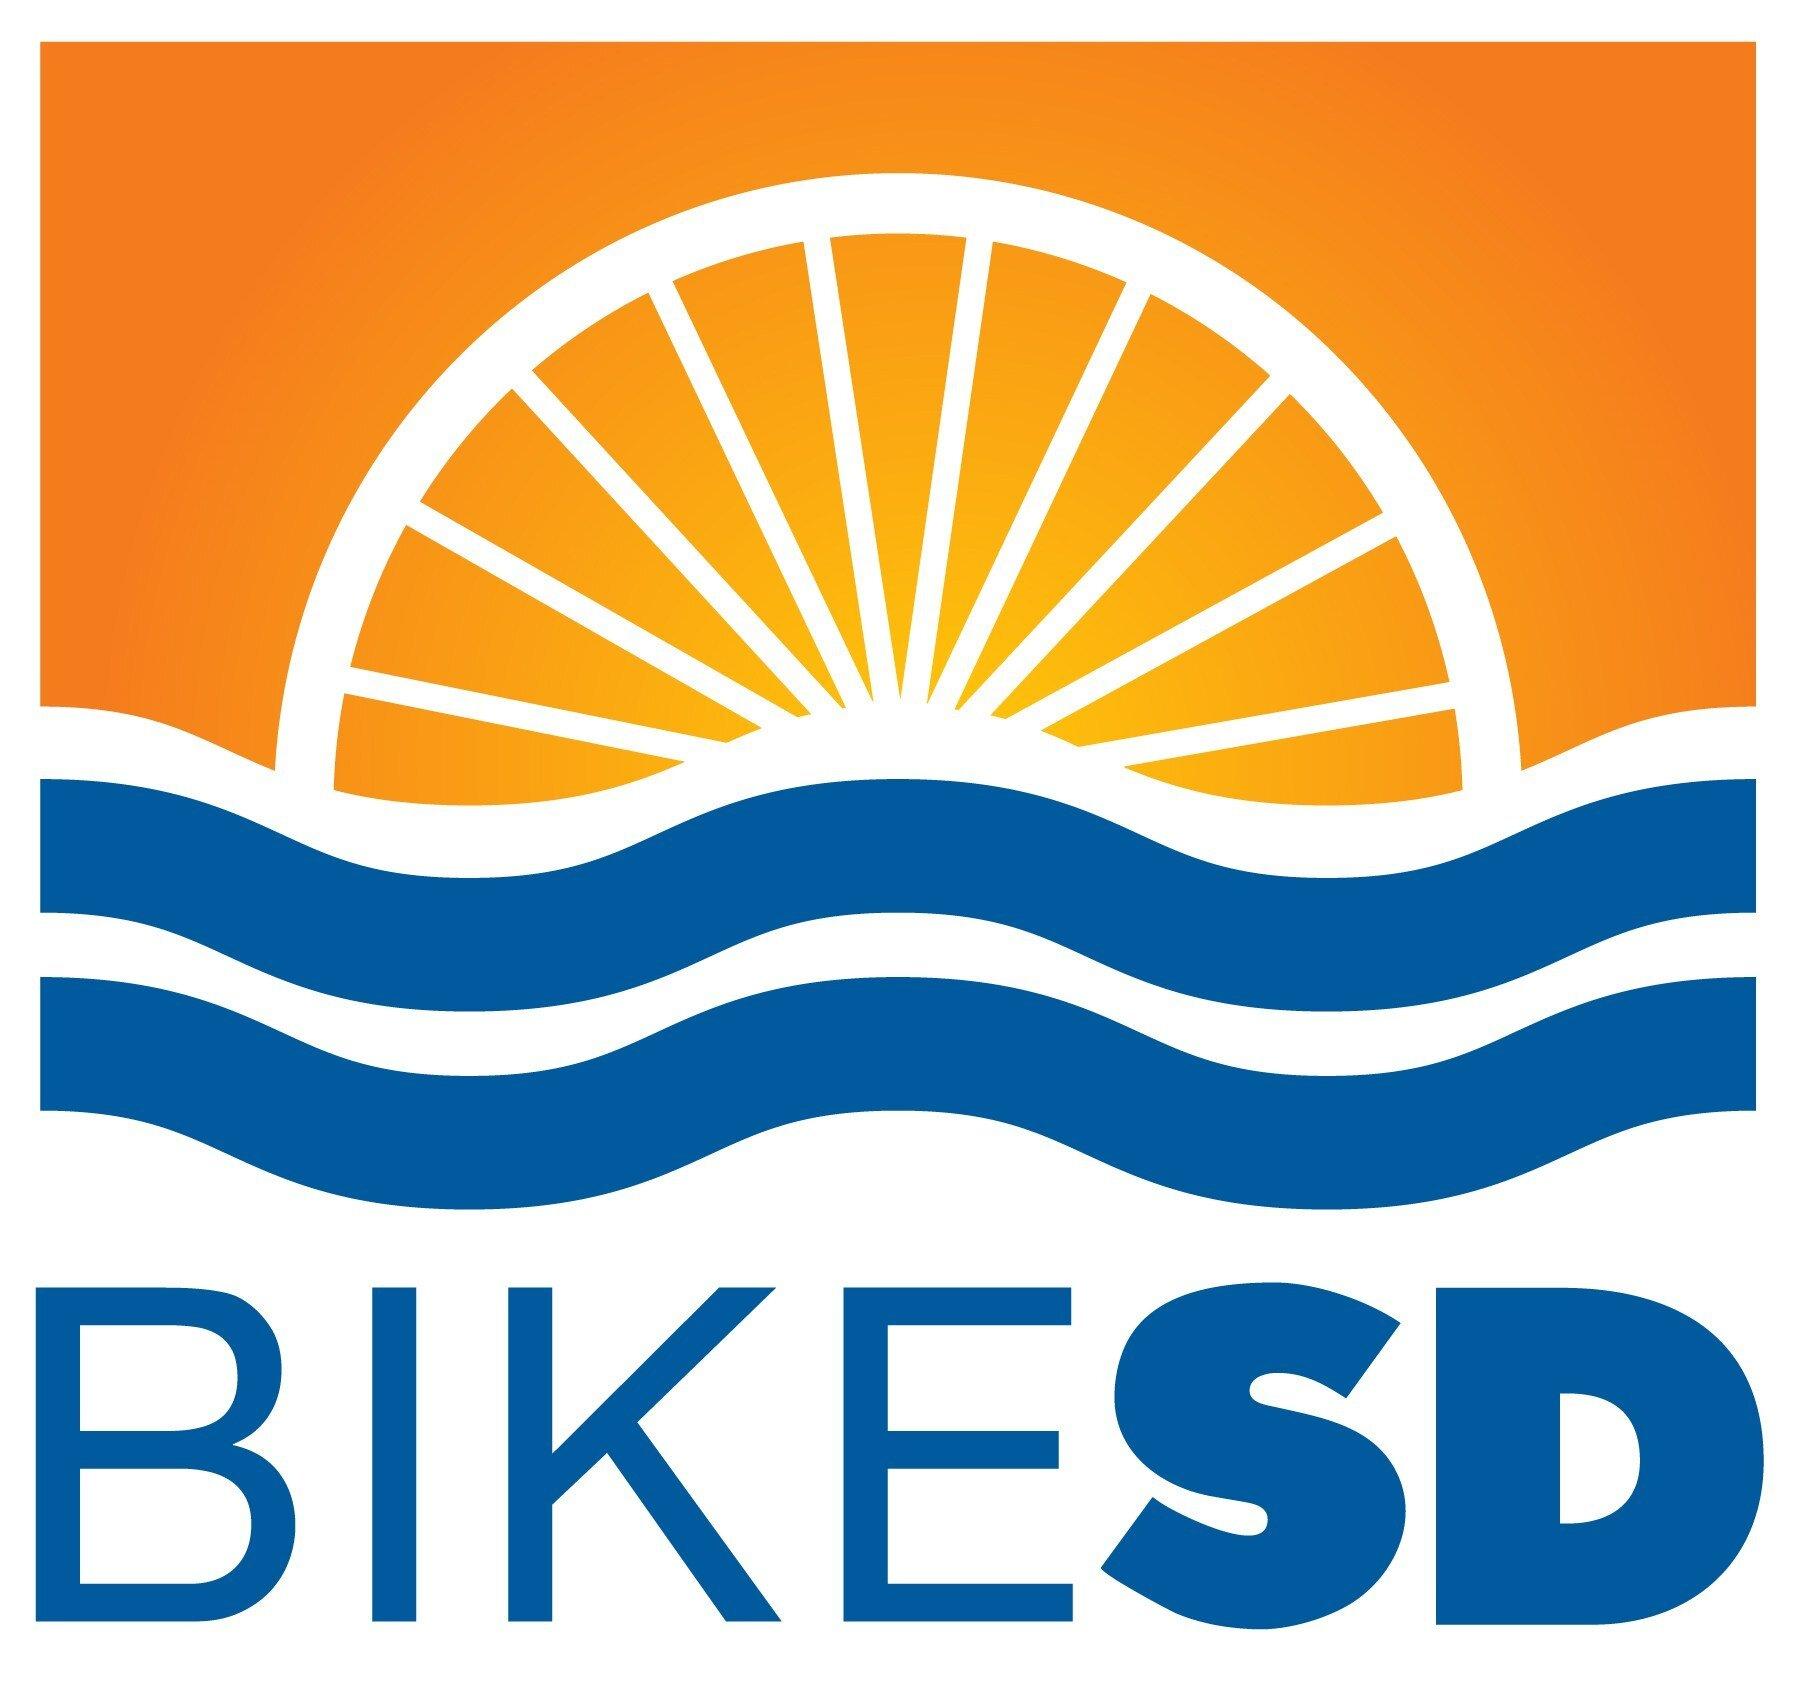 BikeSD logo.jpg